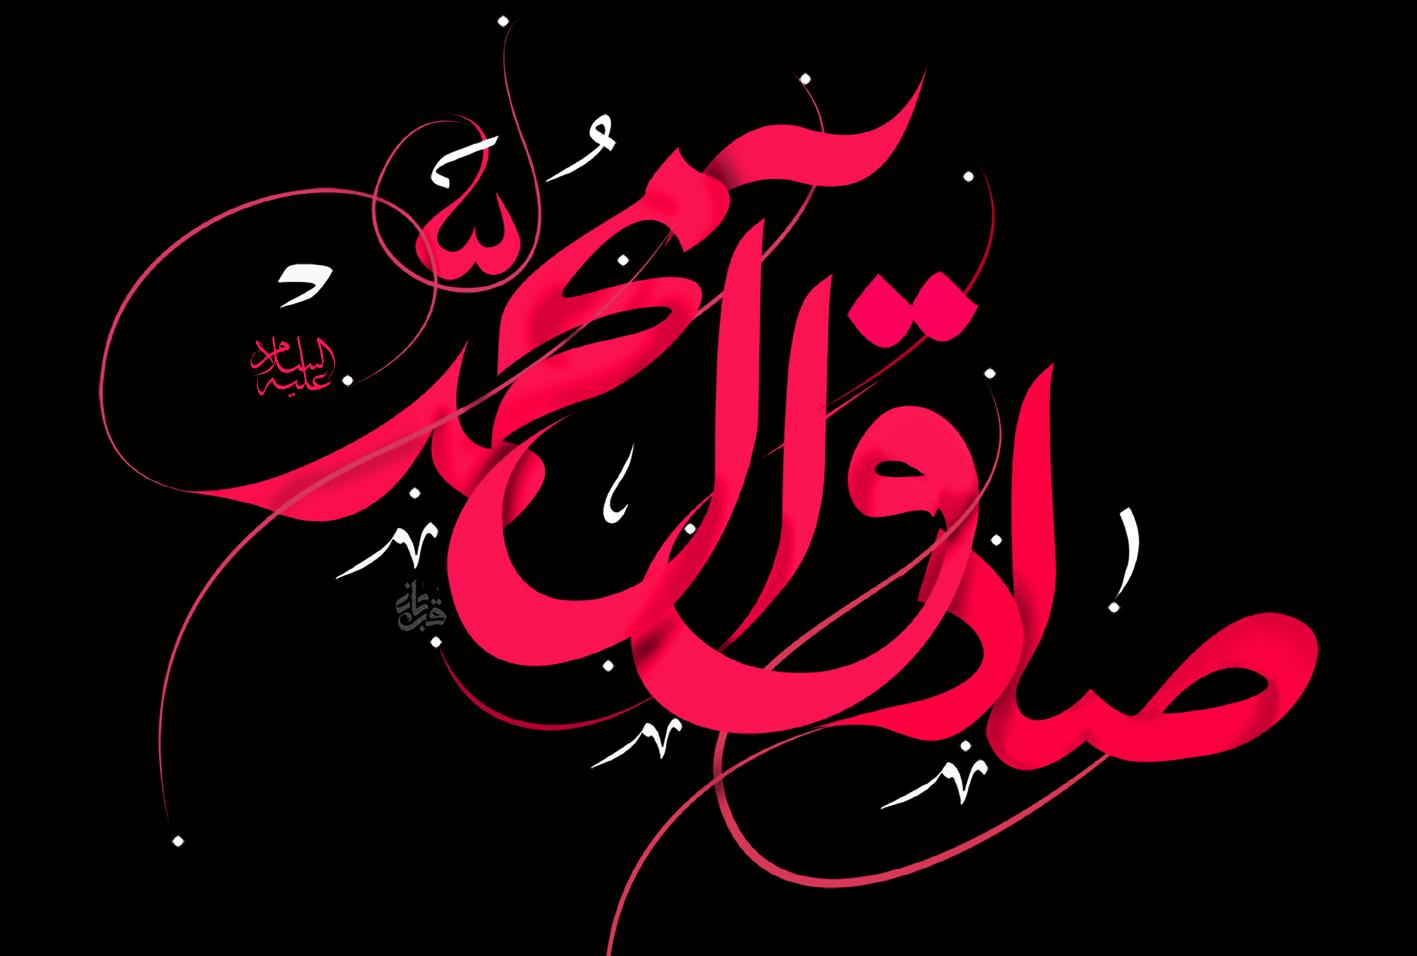 وصیت امام جعفر صادق(ع) به عبدالرحمن بن سیابه